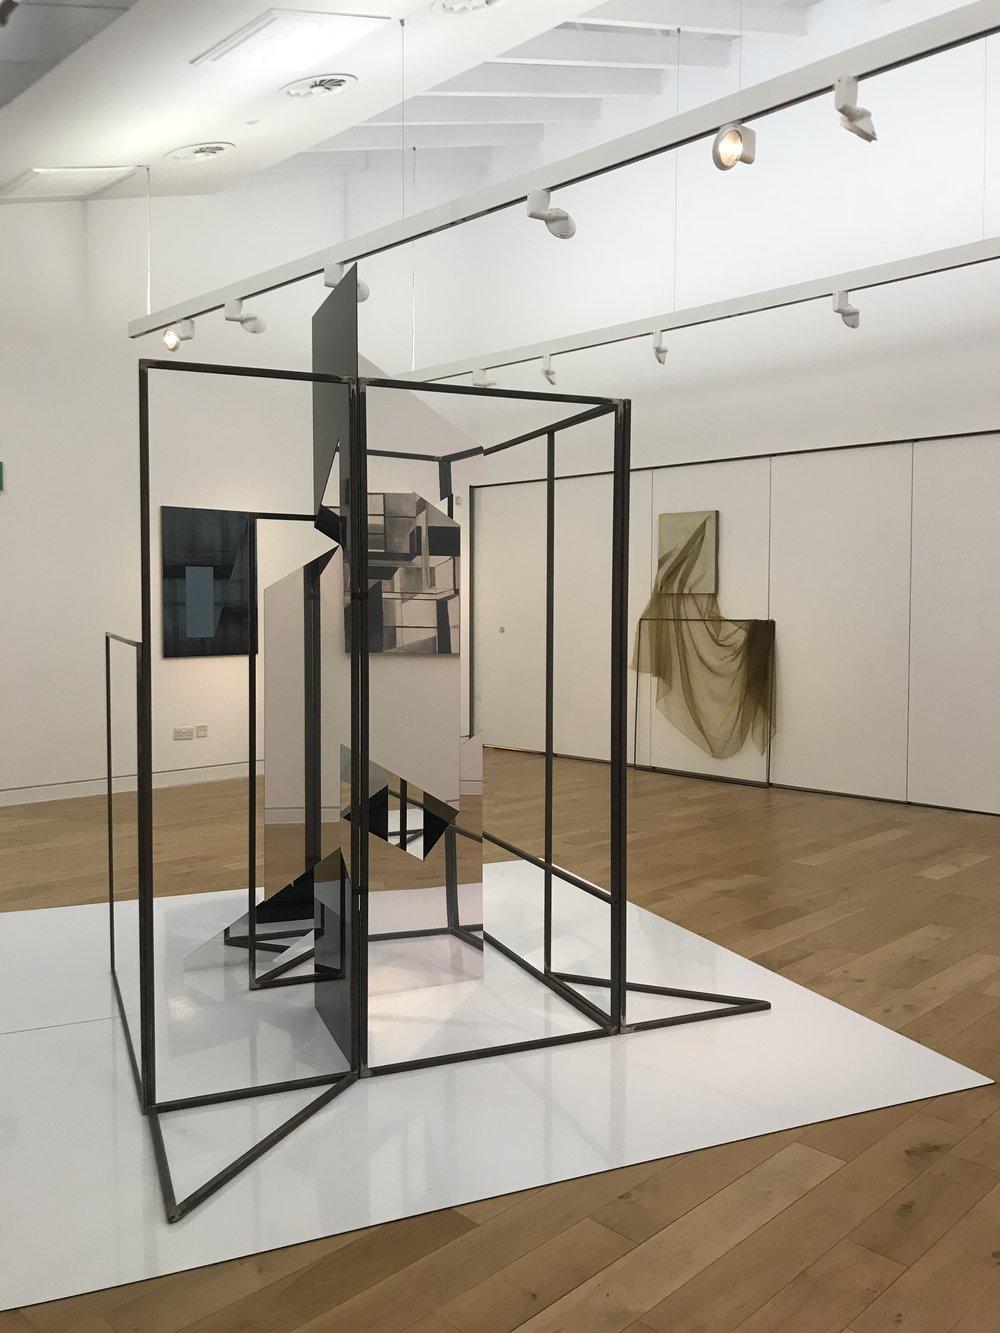 Border Controls. Rosalind Davis and Justin Hibbs Installation Shots at the Sevenoaks Kaleidoscope Gallery 2018. Photo 06-11-2018, 15 42 59.jpg